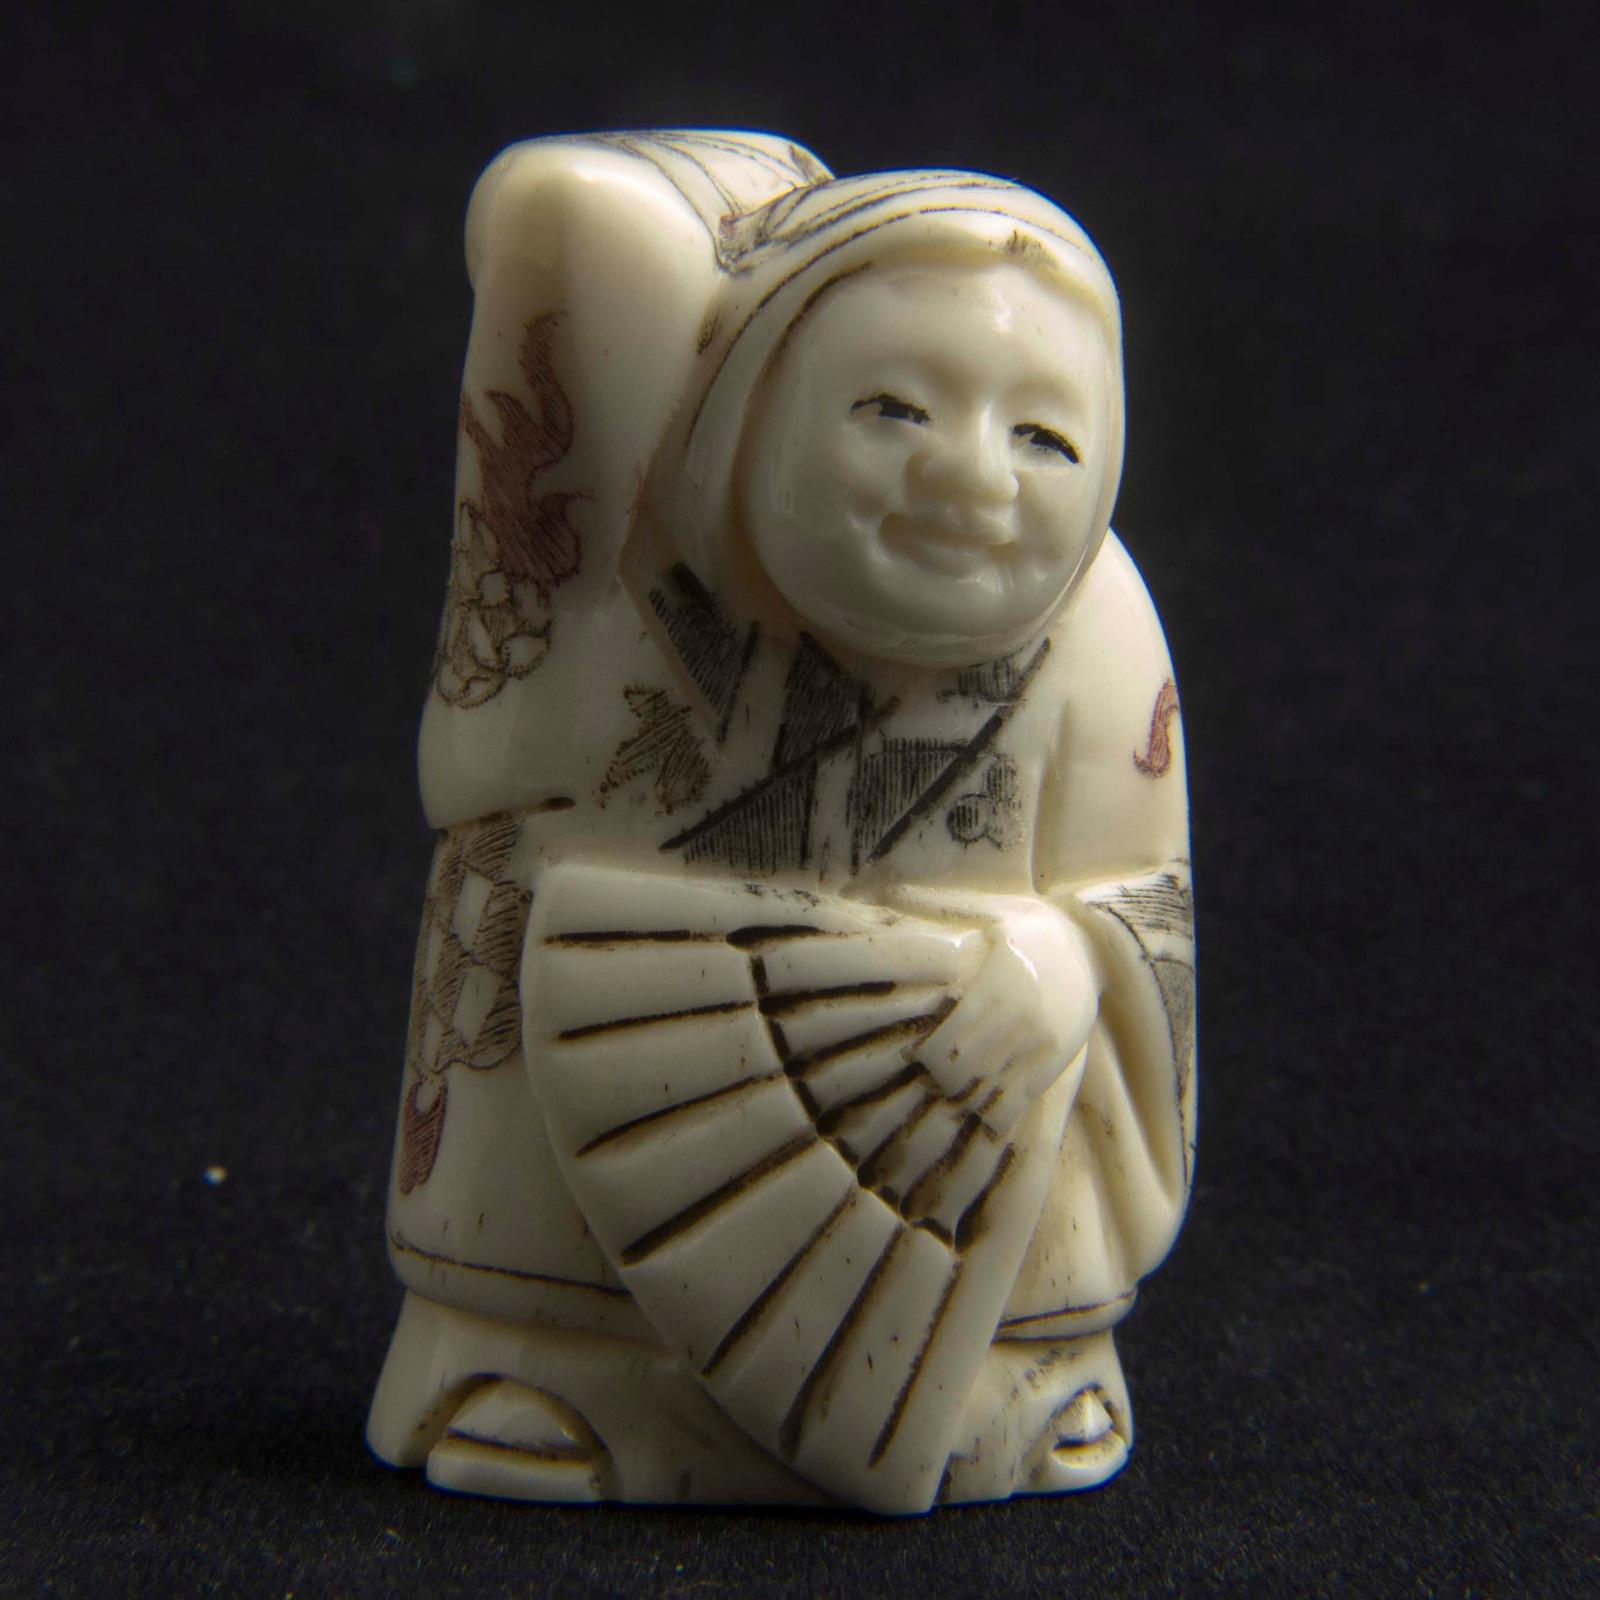 Japanese Carved Bone Netsuke 3210 La180386 Loveantiques Com